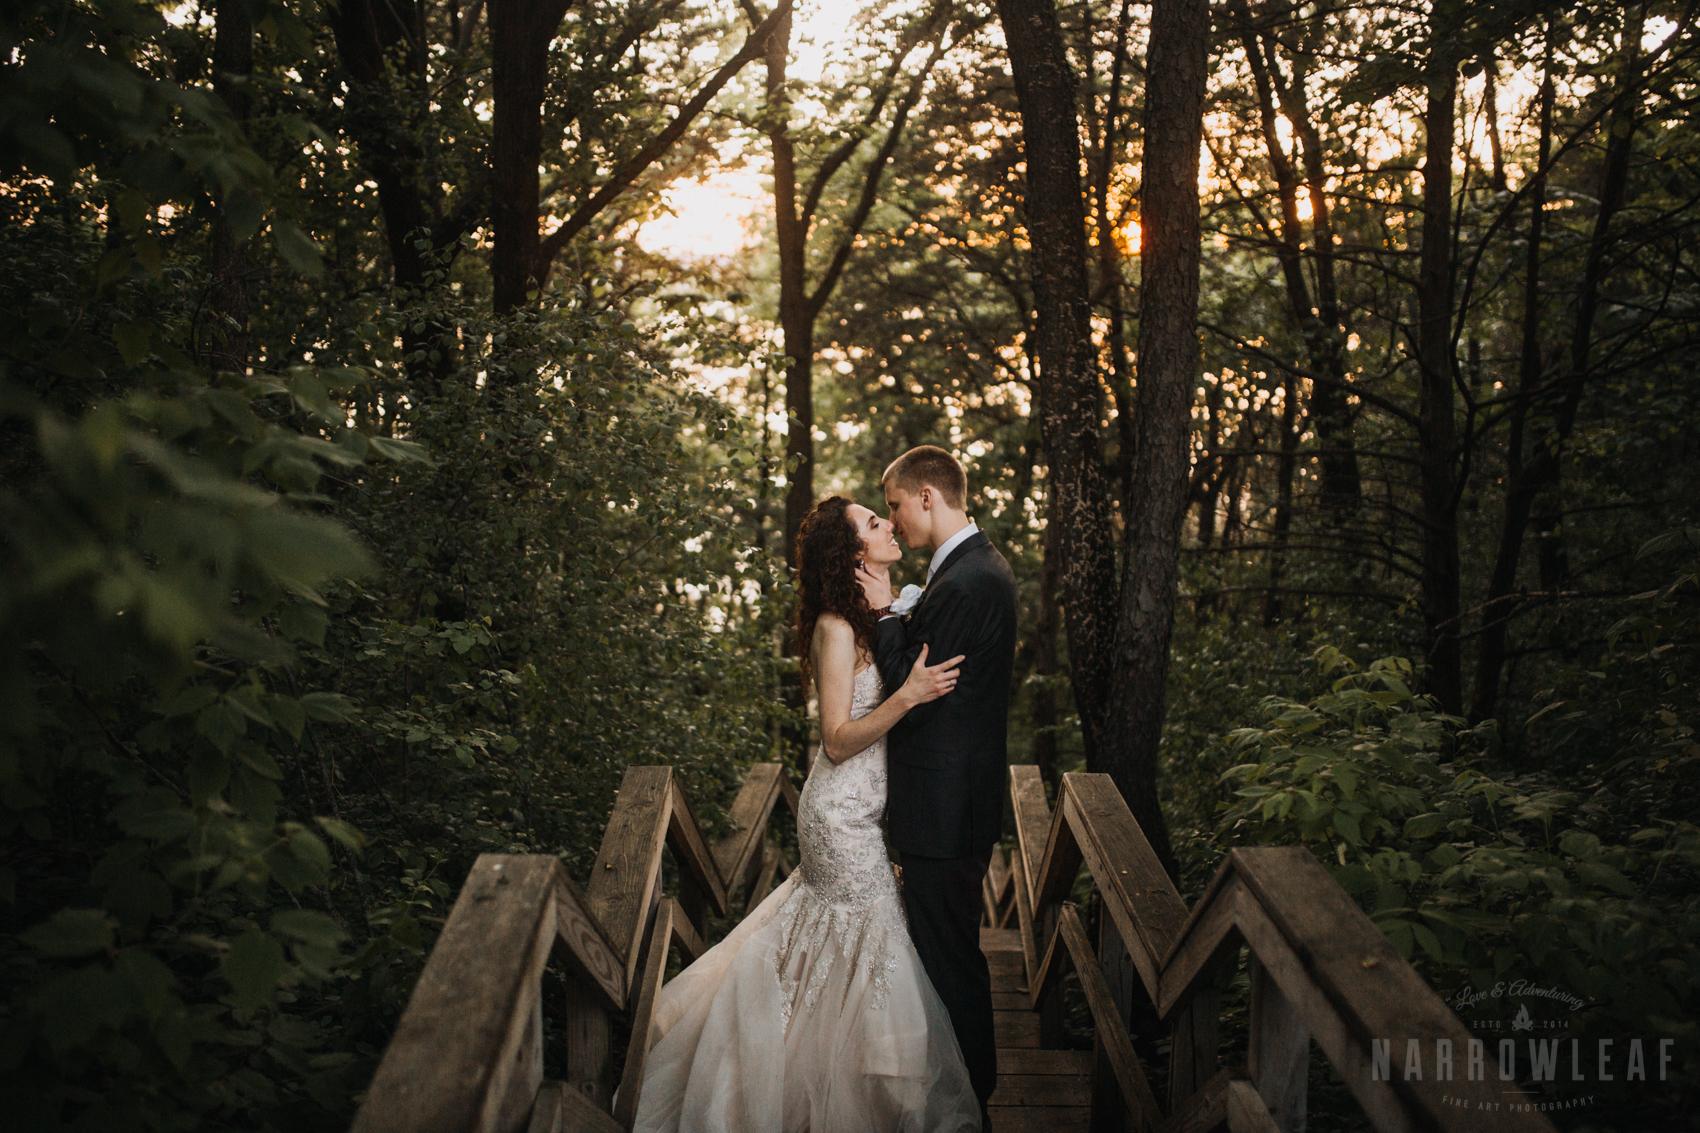 bride-mermaid-lace-wedding-gown-glitter-woods-sunset-305.jpg